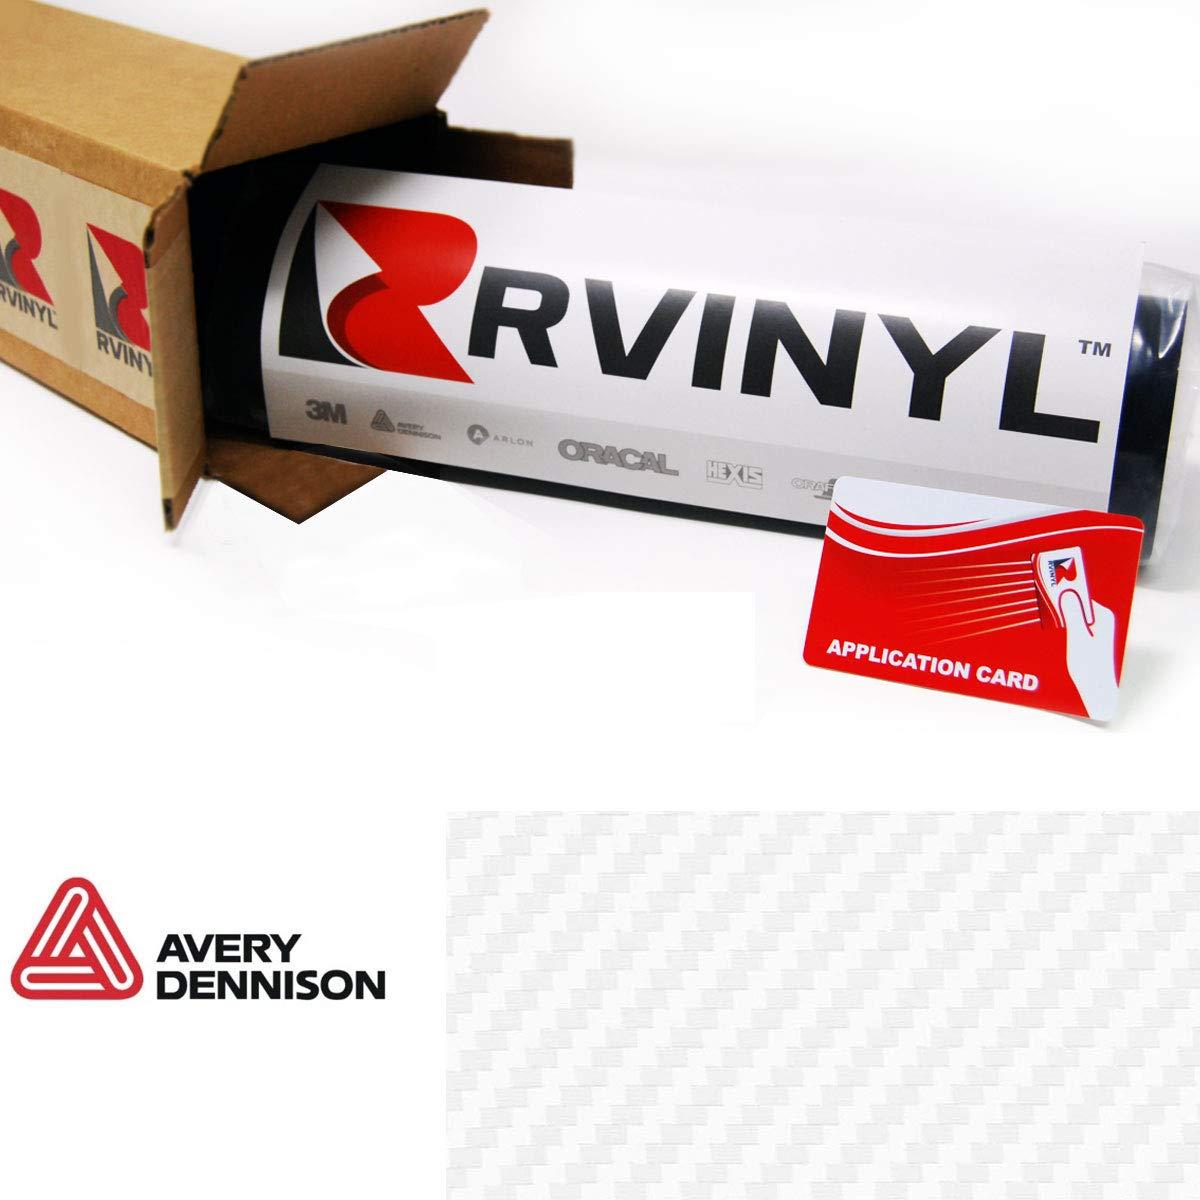 "Avery SW900 115-X White Carbon Fiber Supreme Wrapping Film Vinyl Vehicle Car Wrap Sheet Roll - (12"" x 60"" w/Application Card)"